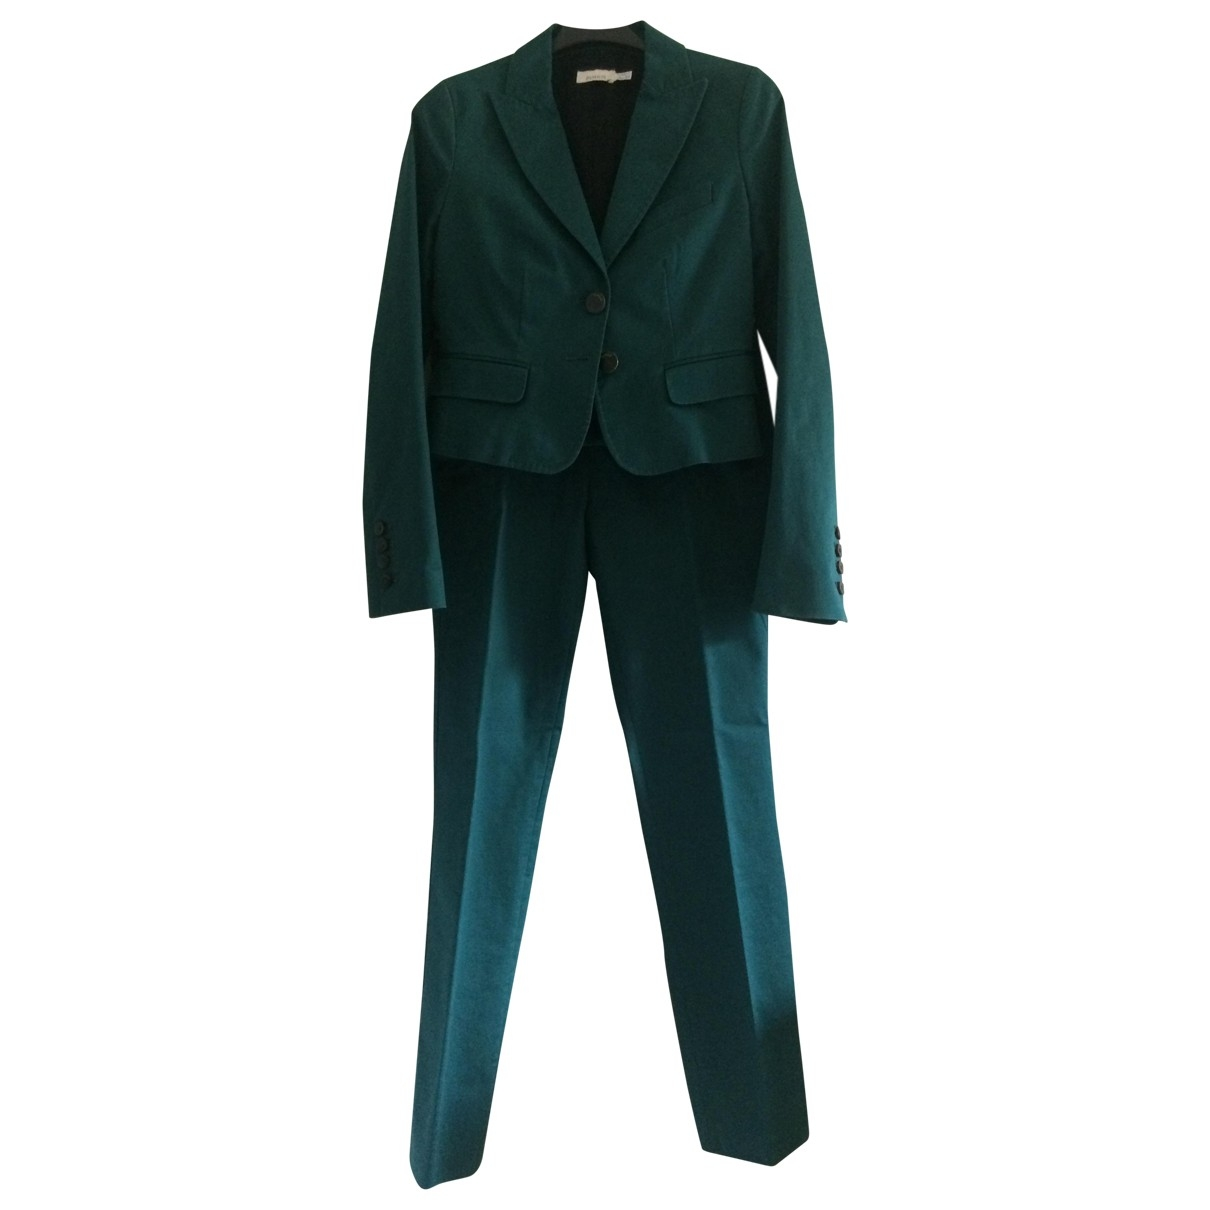 Pinko \N Green Cotton jacket for Women 42 IT